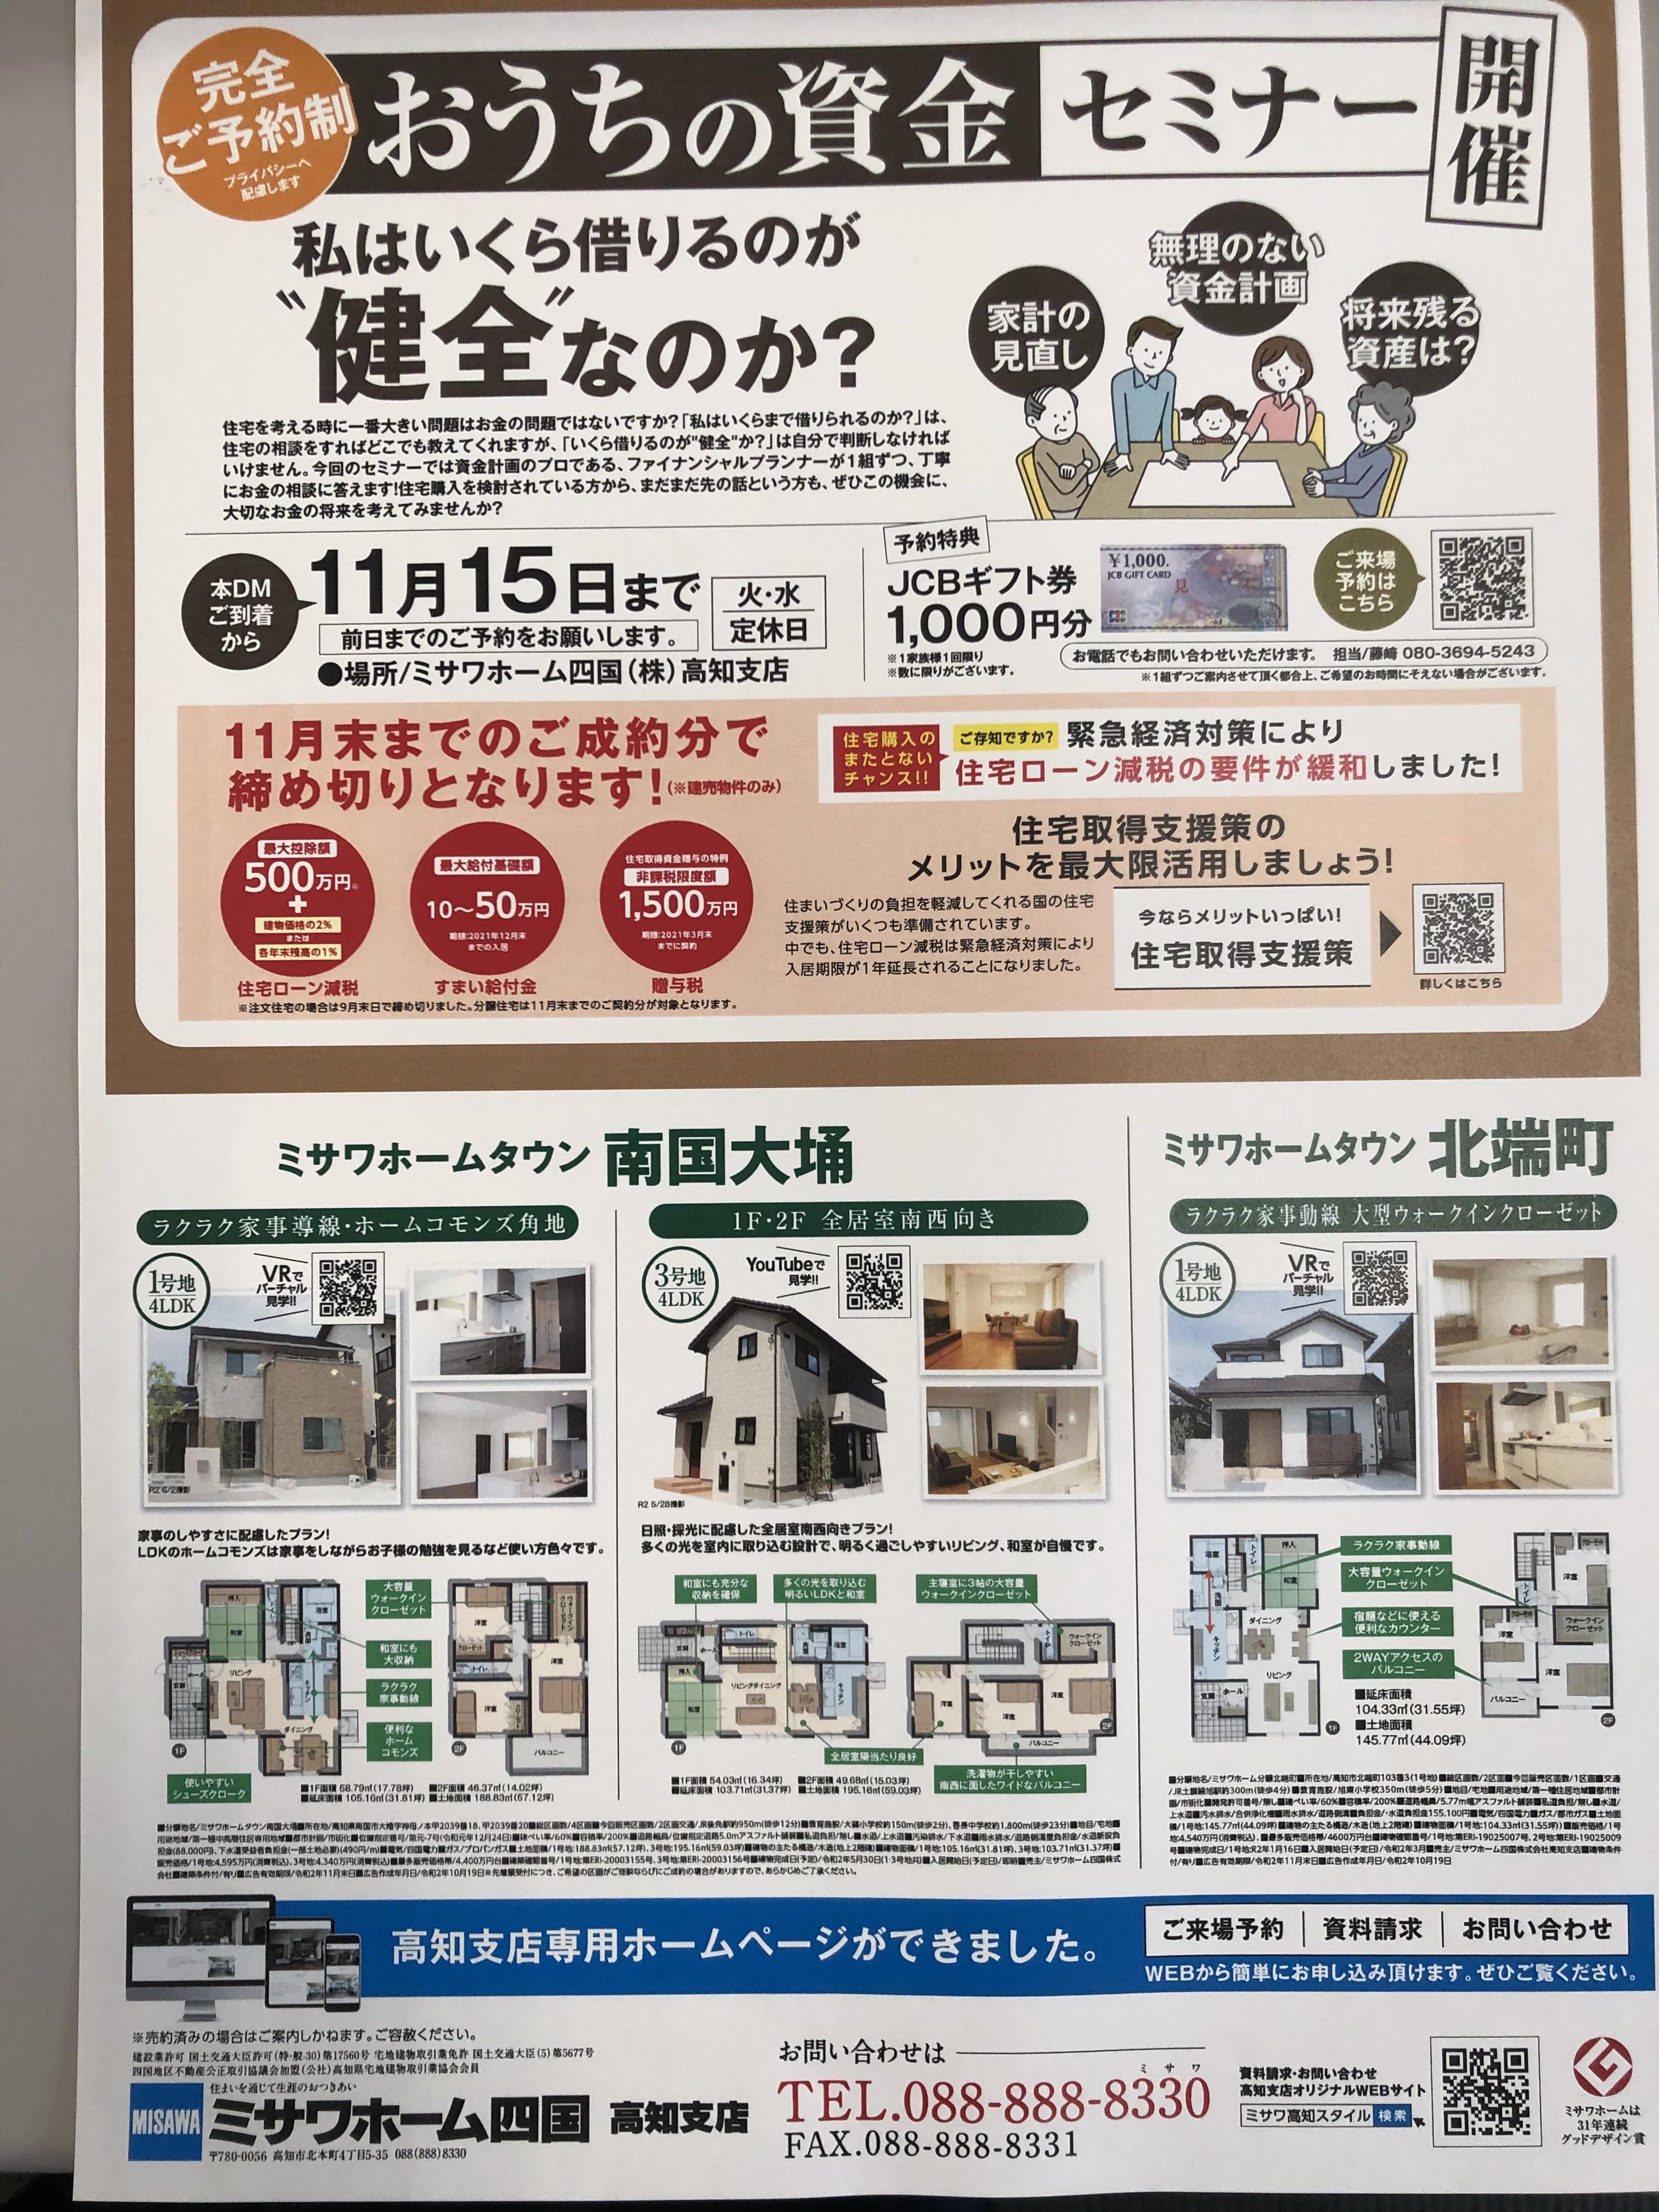 https://shikoku.misawa.co.jp/area_kouchi/bdf8dab3d7520e7f054eff1cf668cda95dc0986c.jpg